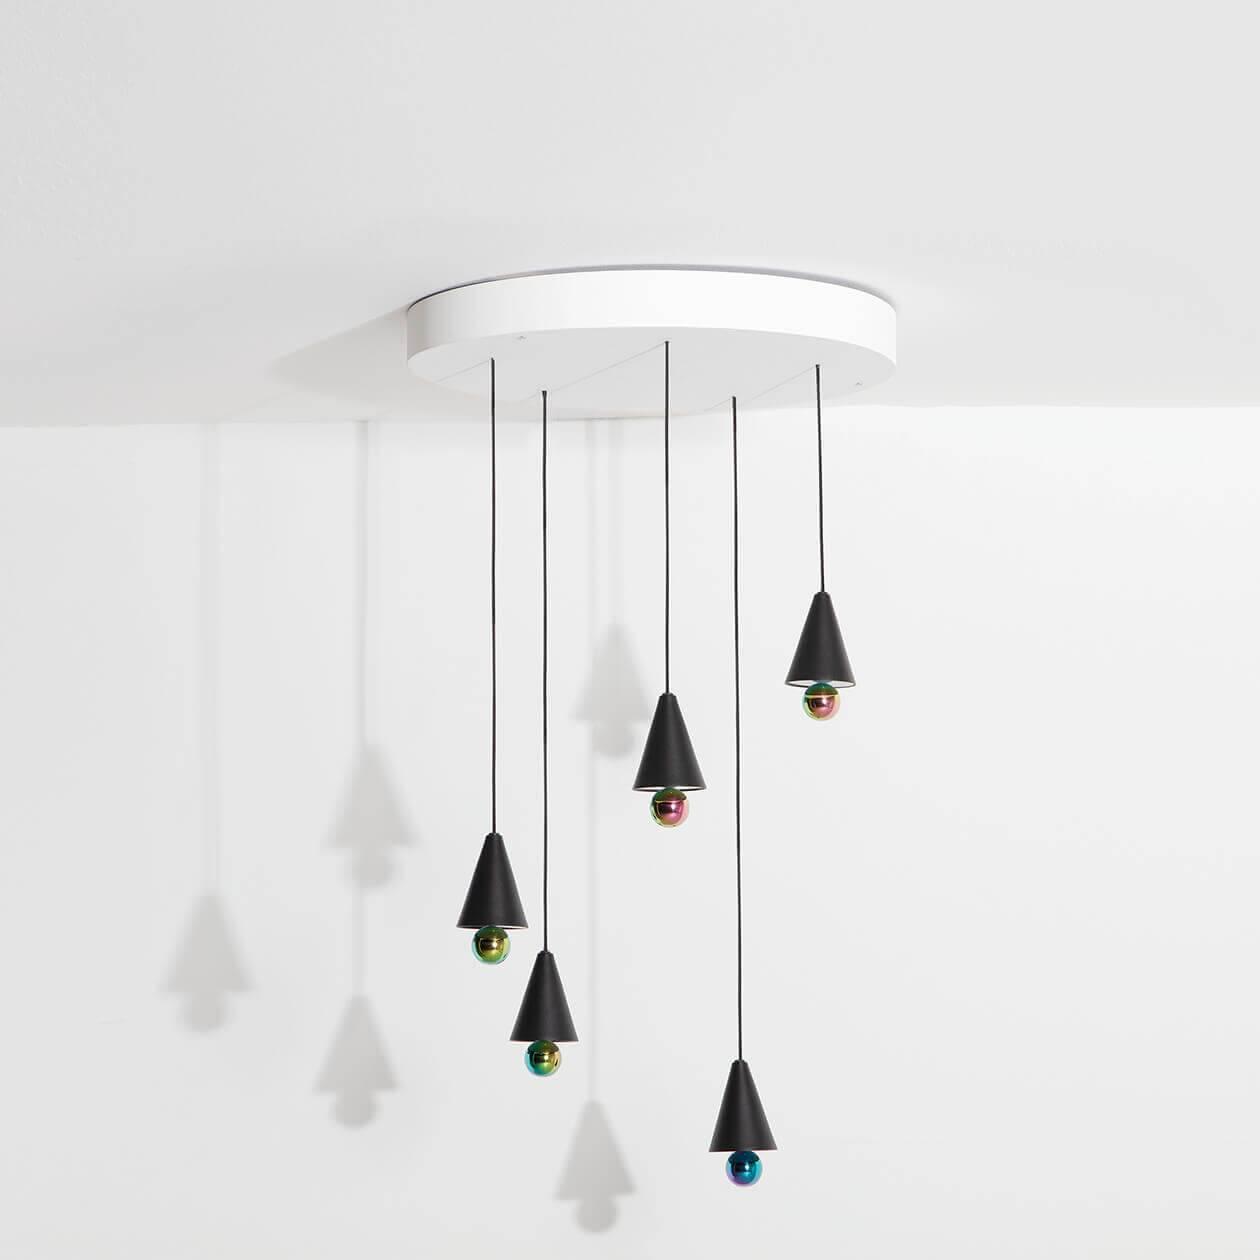 Lifestyle-Chandelier-Cherry-LED-black-Petite-Friture